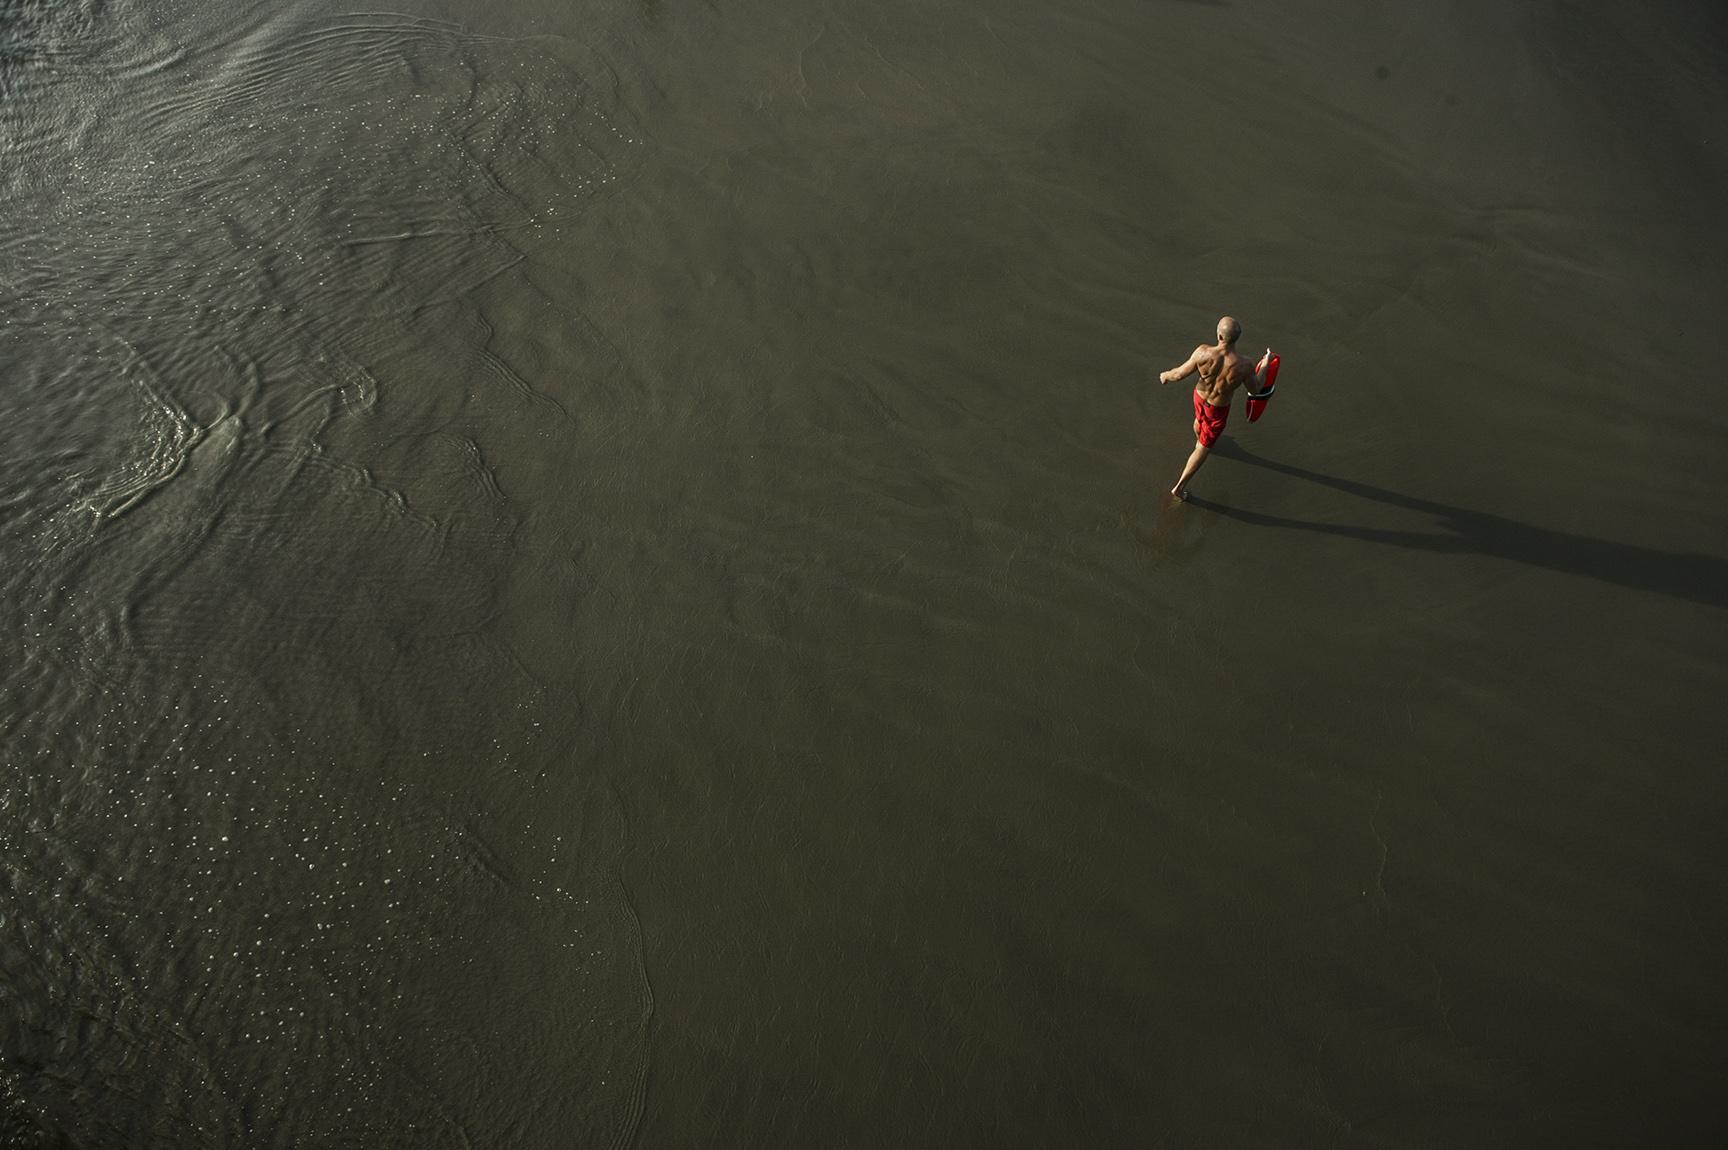 A lifeguard patrols the beaches of Santa Monica.